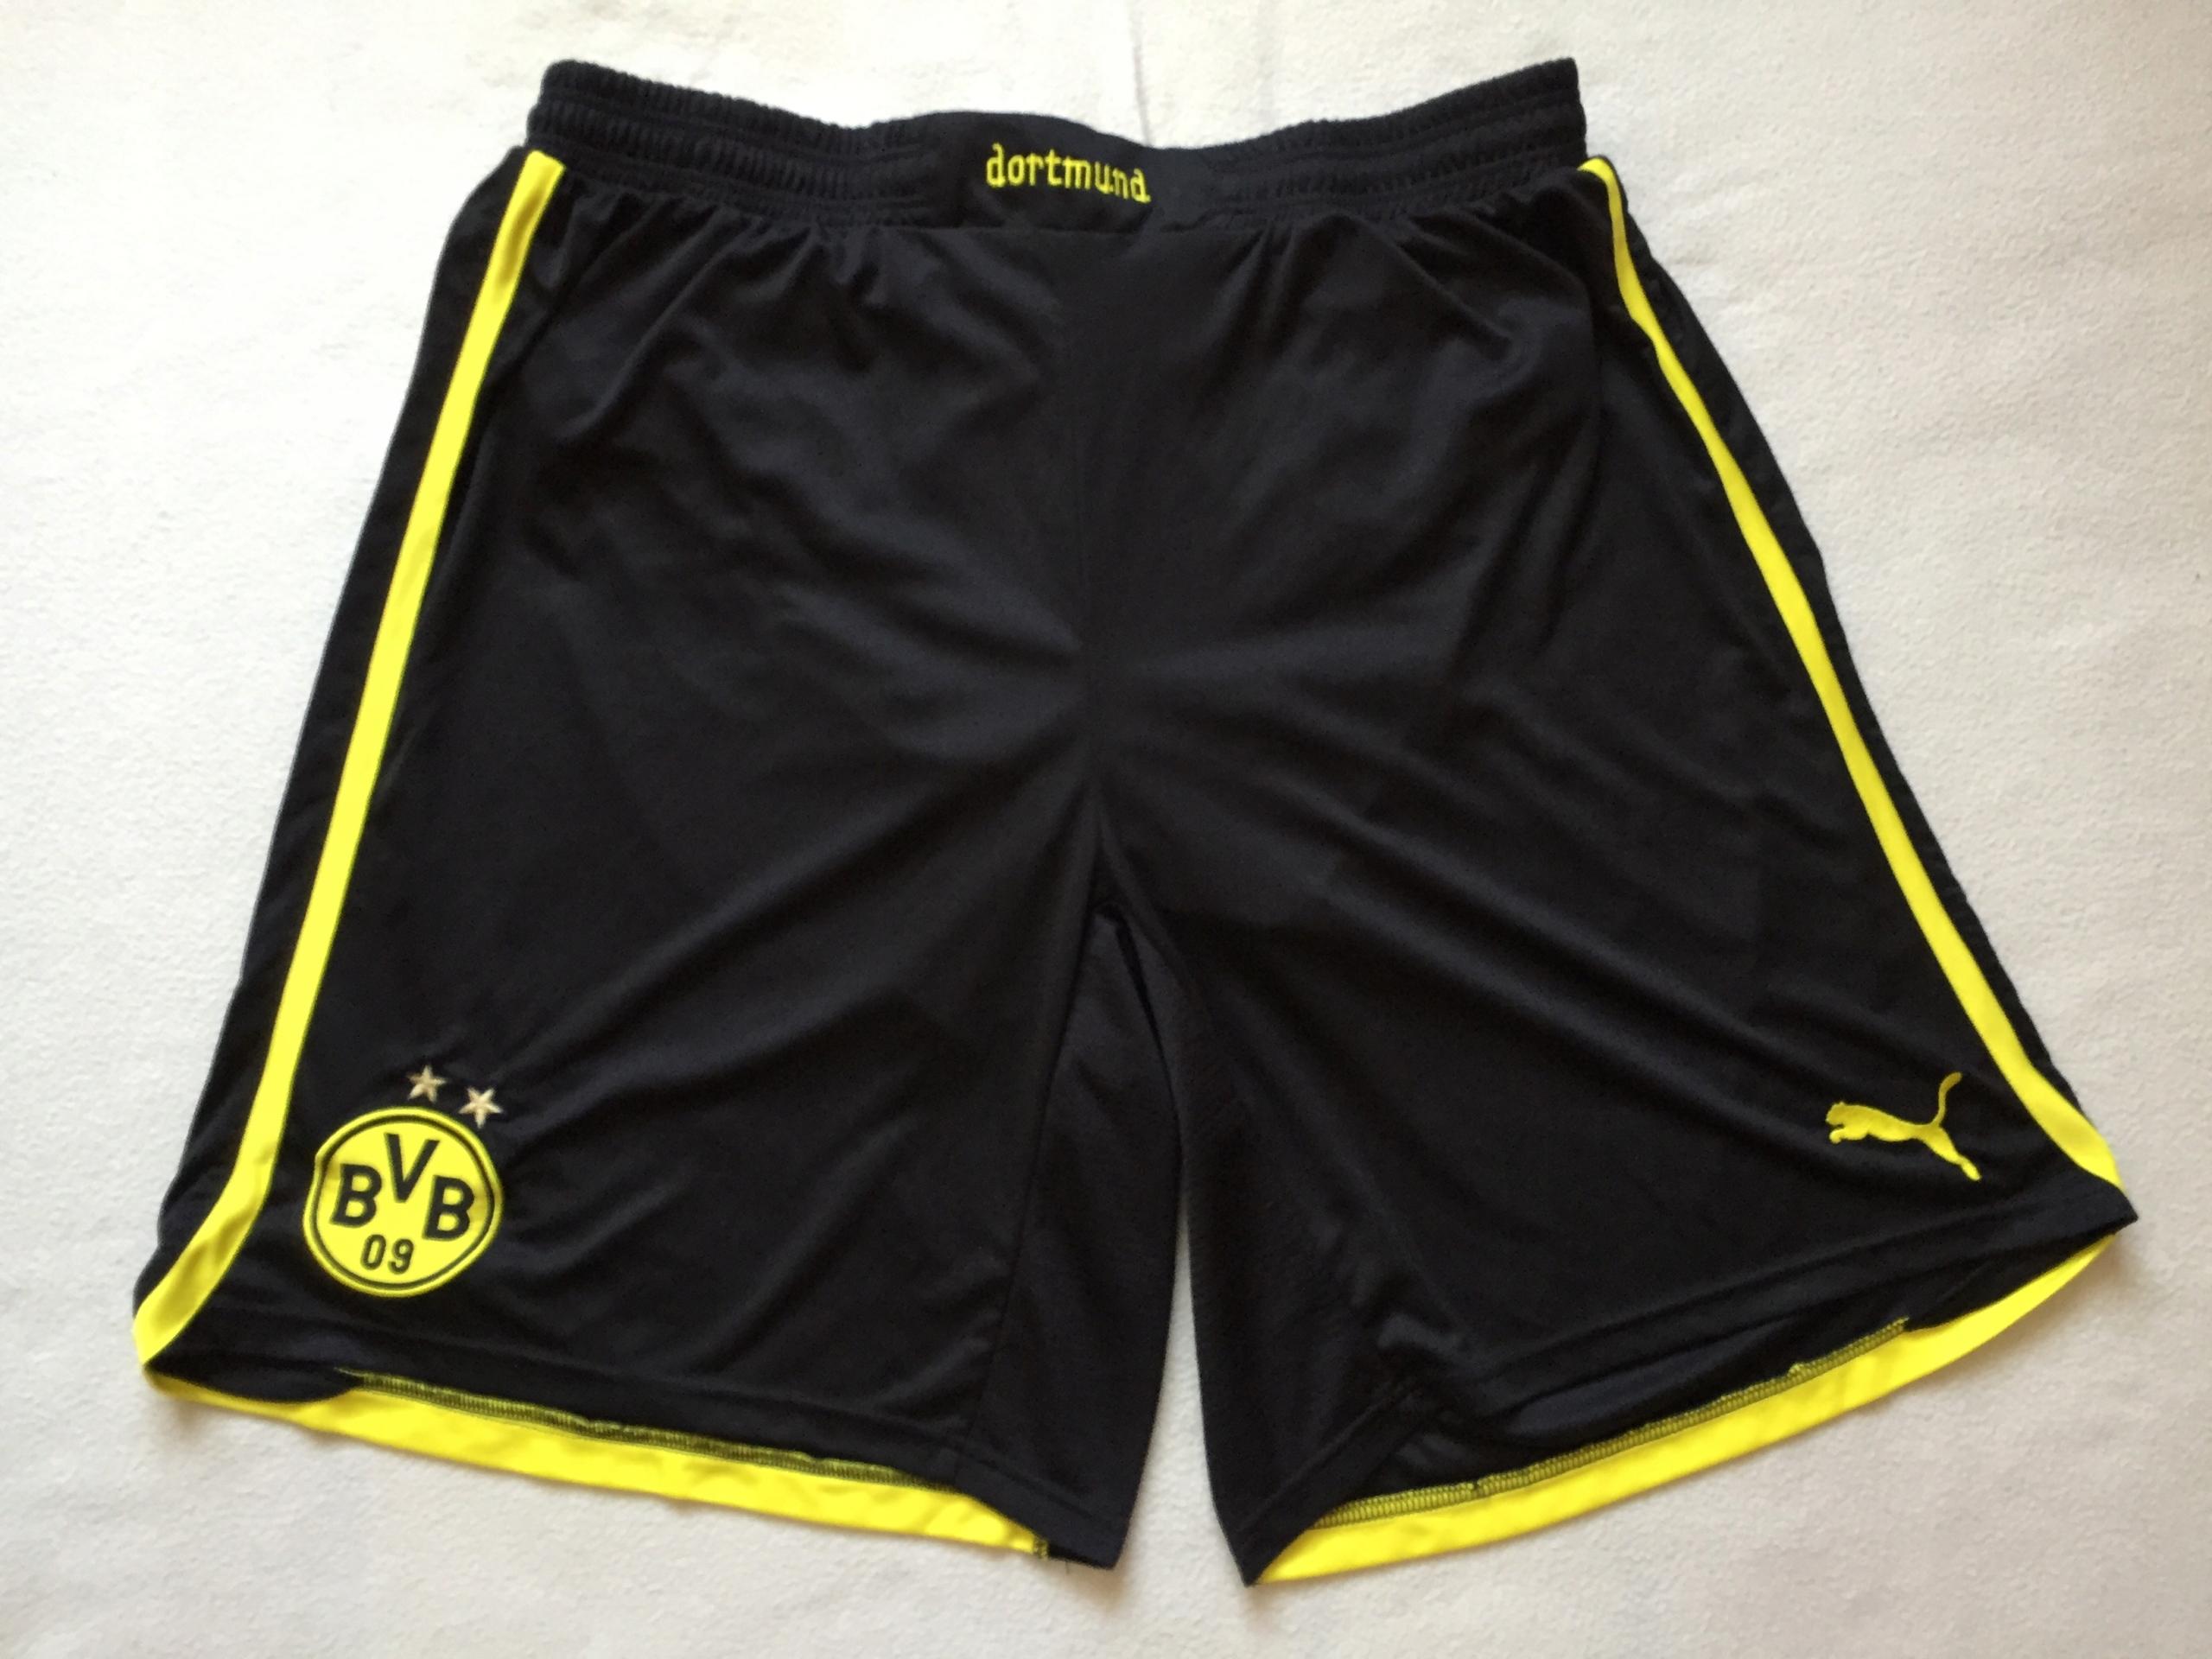 Spodenki BVB Borussia Dortmund-rozm.XXL